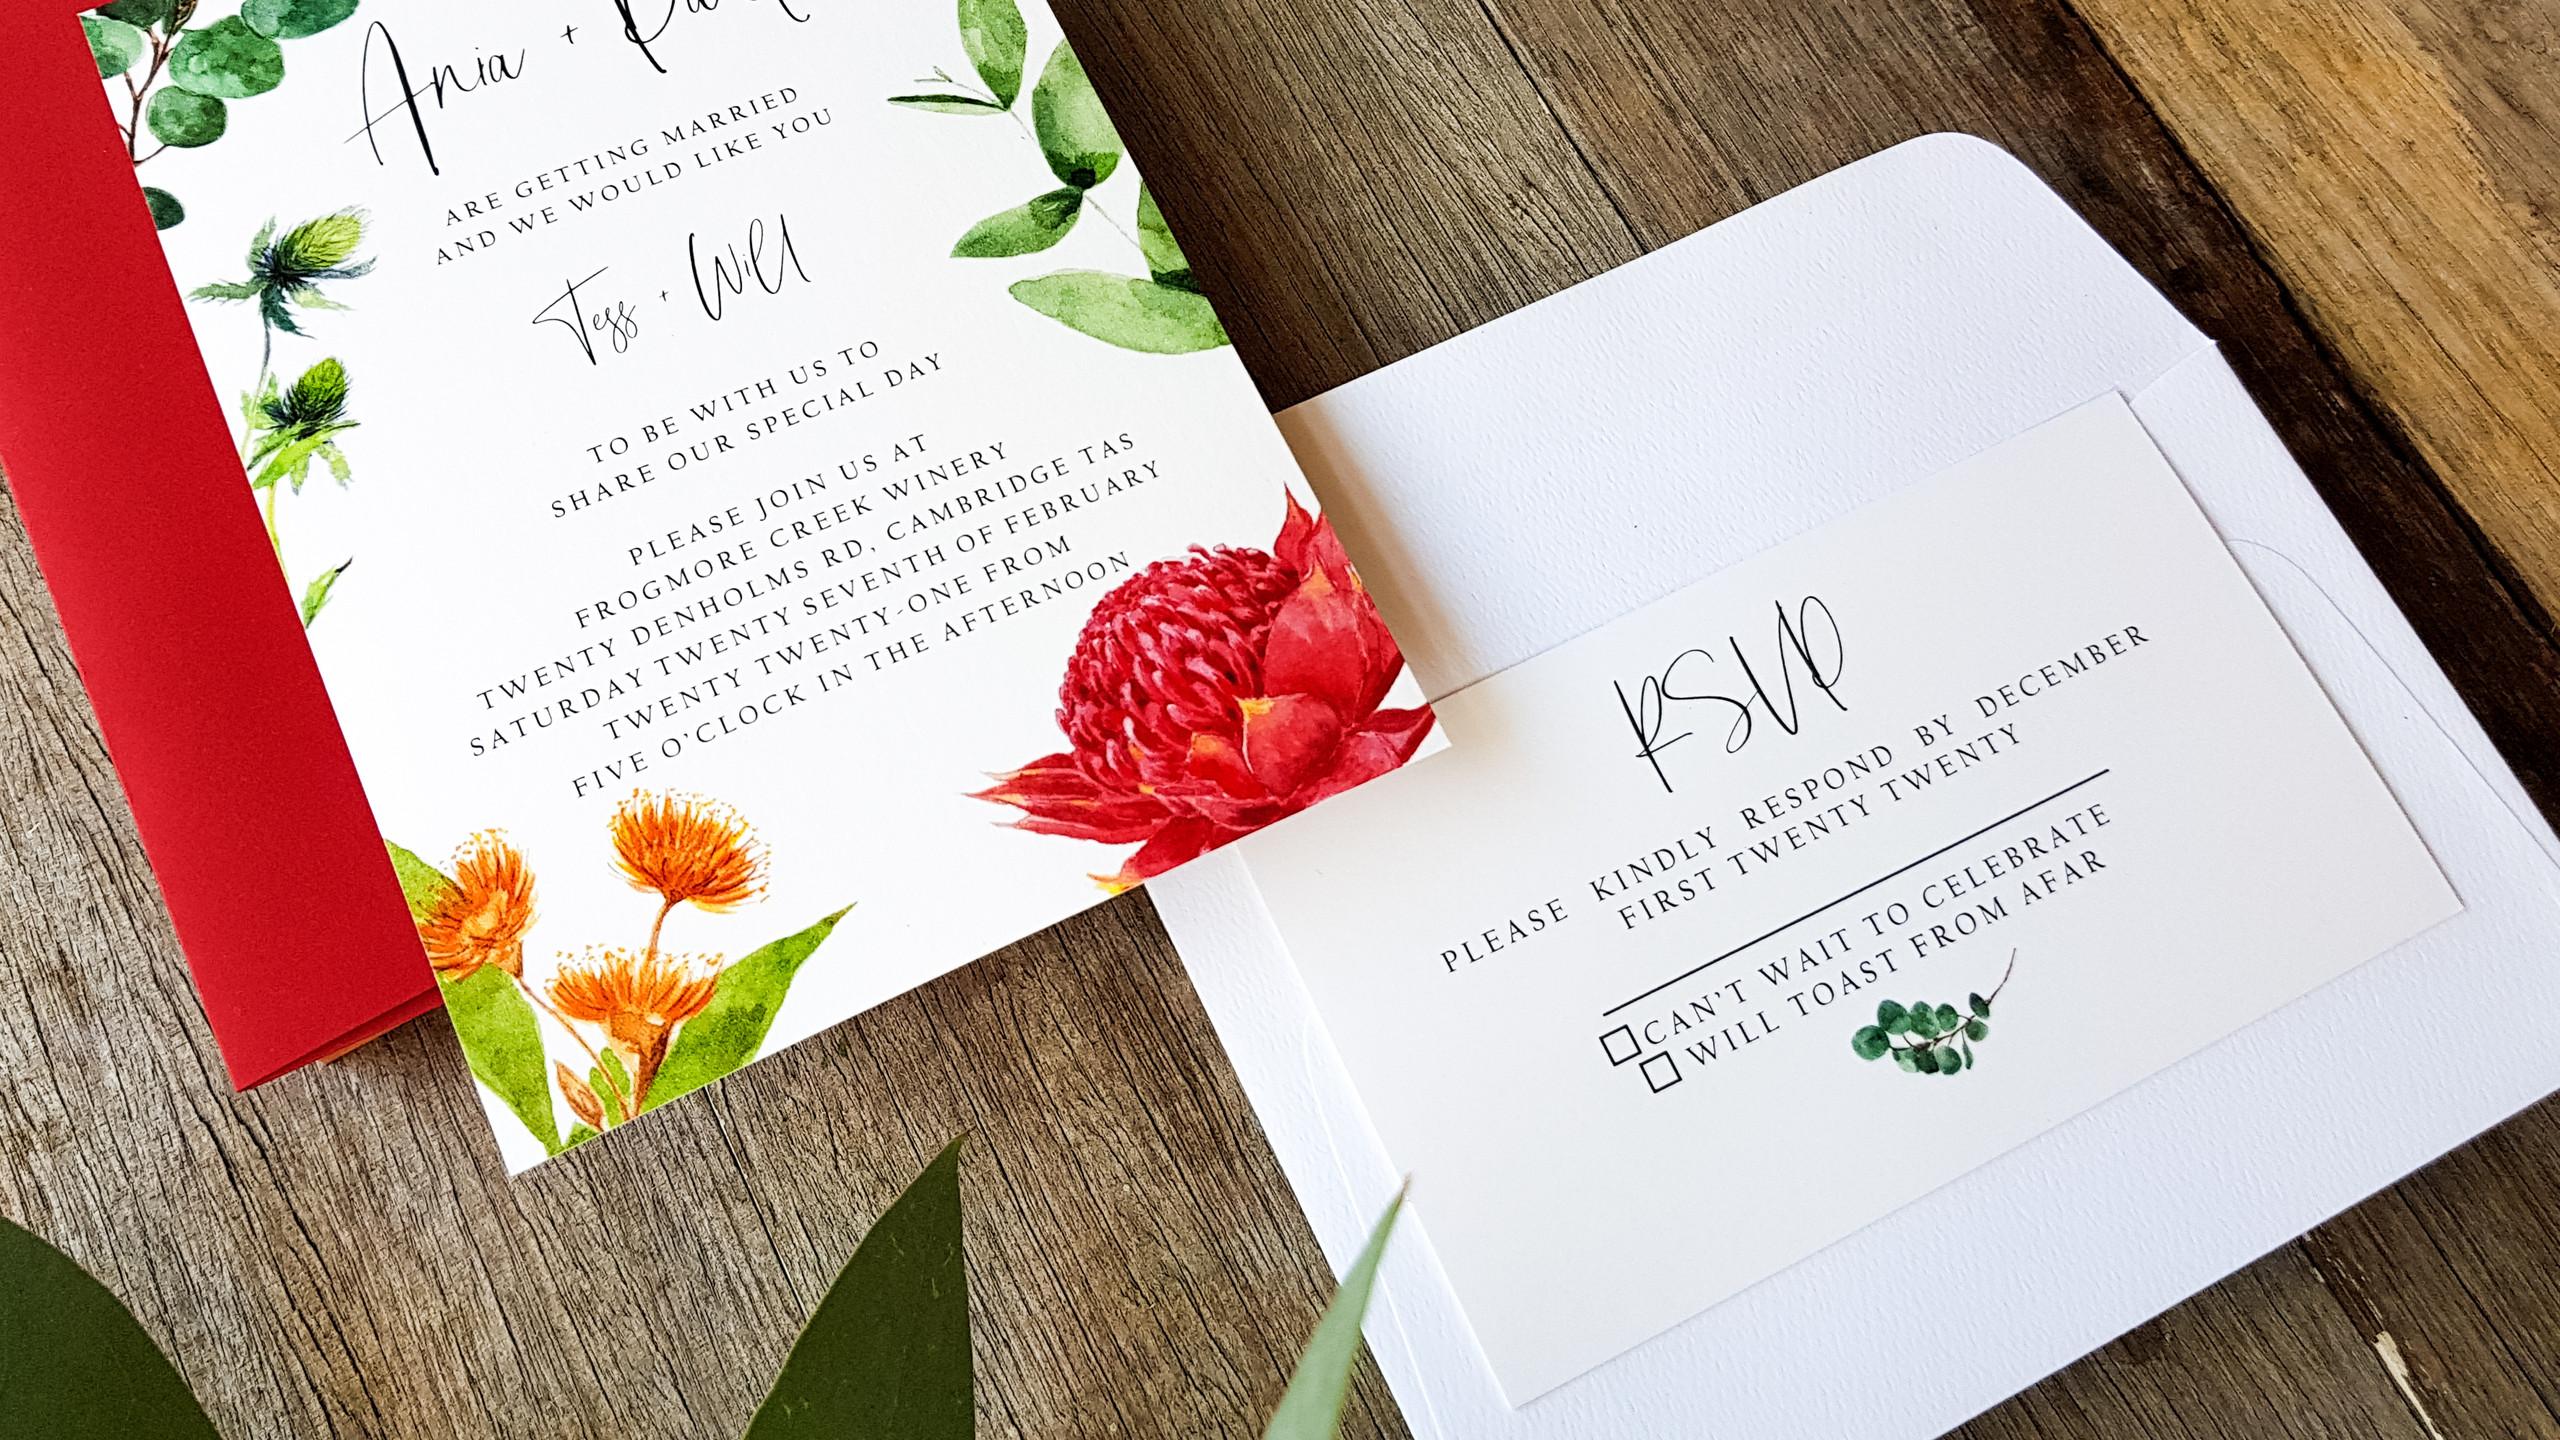 Watercolour Wedding Invitation featuring Australian and Tasmanian Flora